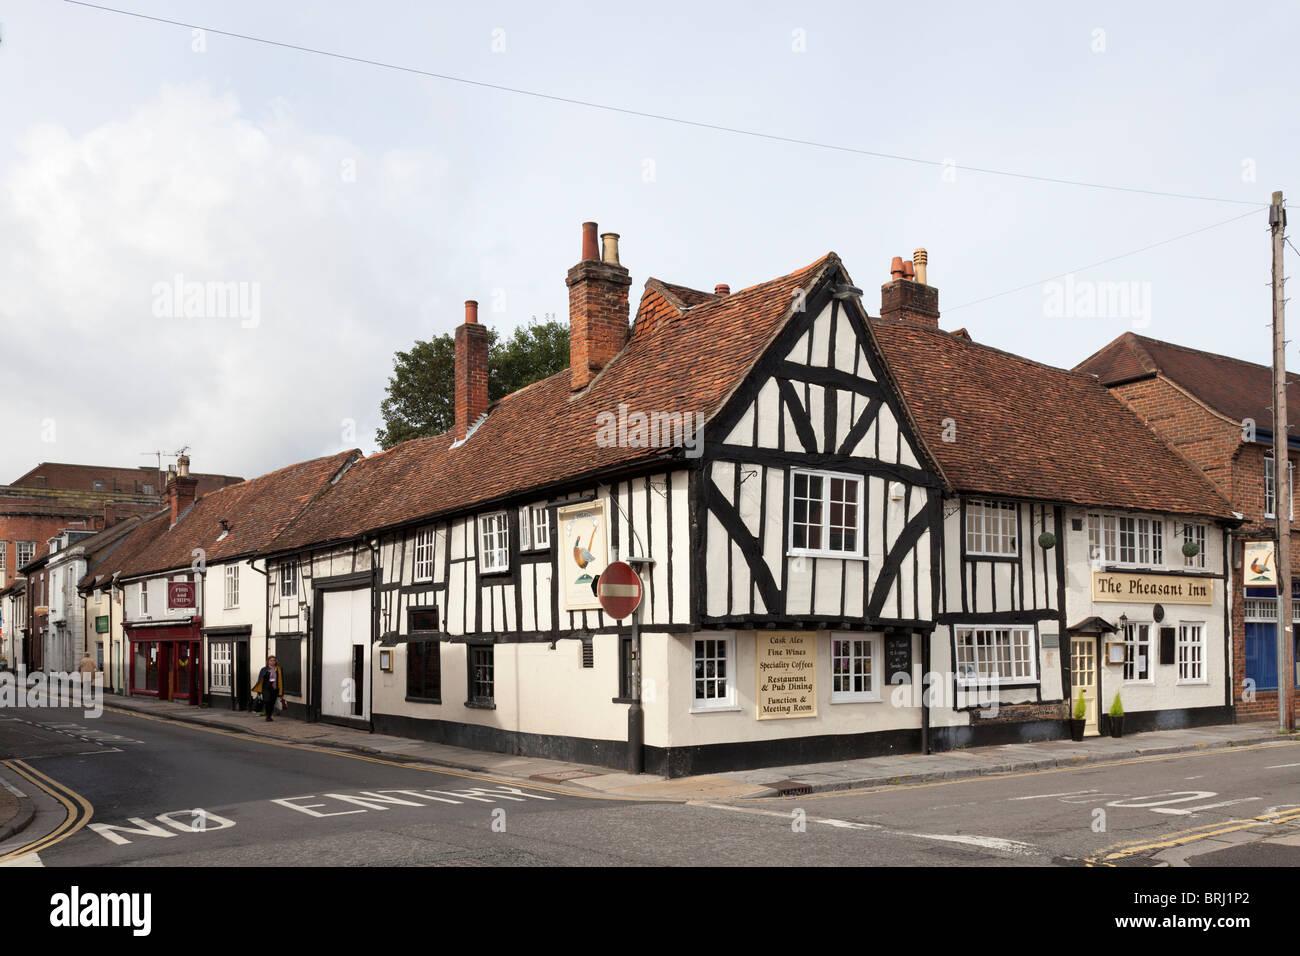 The Pheasent Inn, 16th Century pub in Salisbury - Stock Image